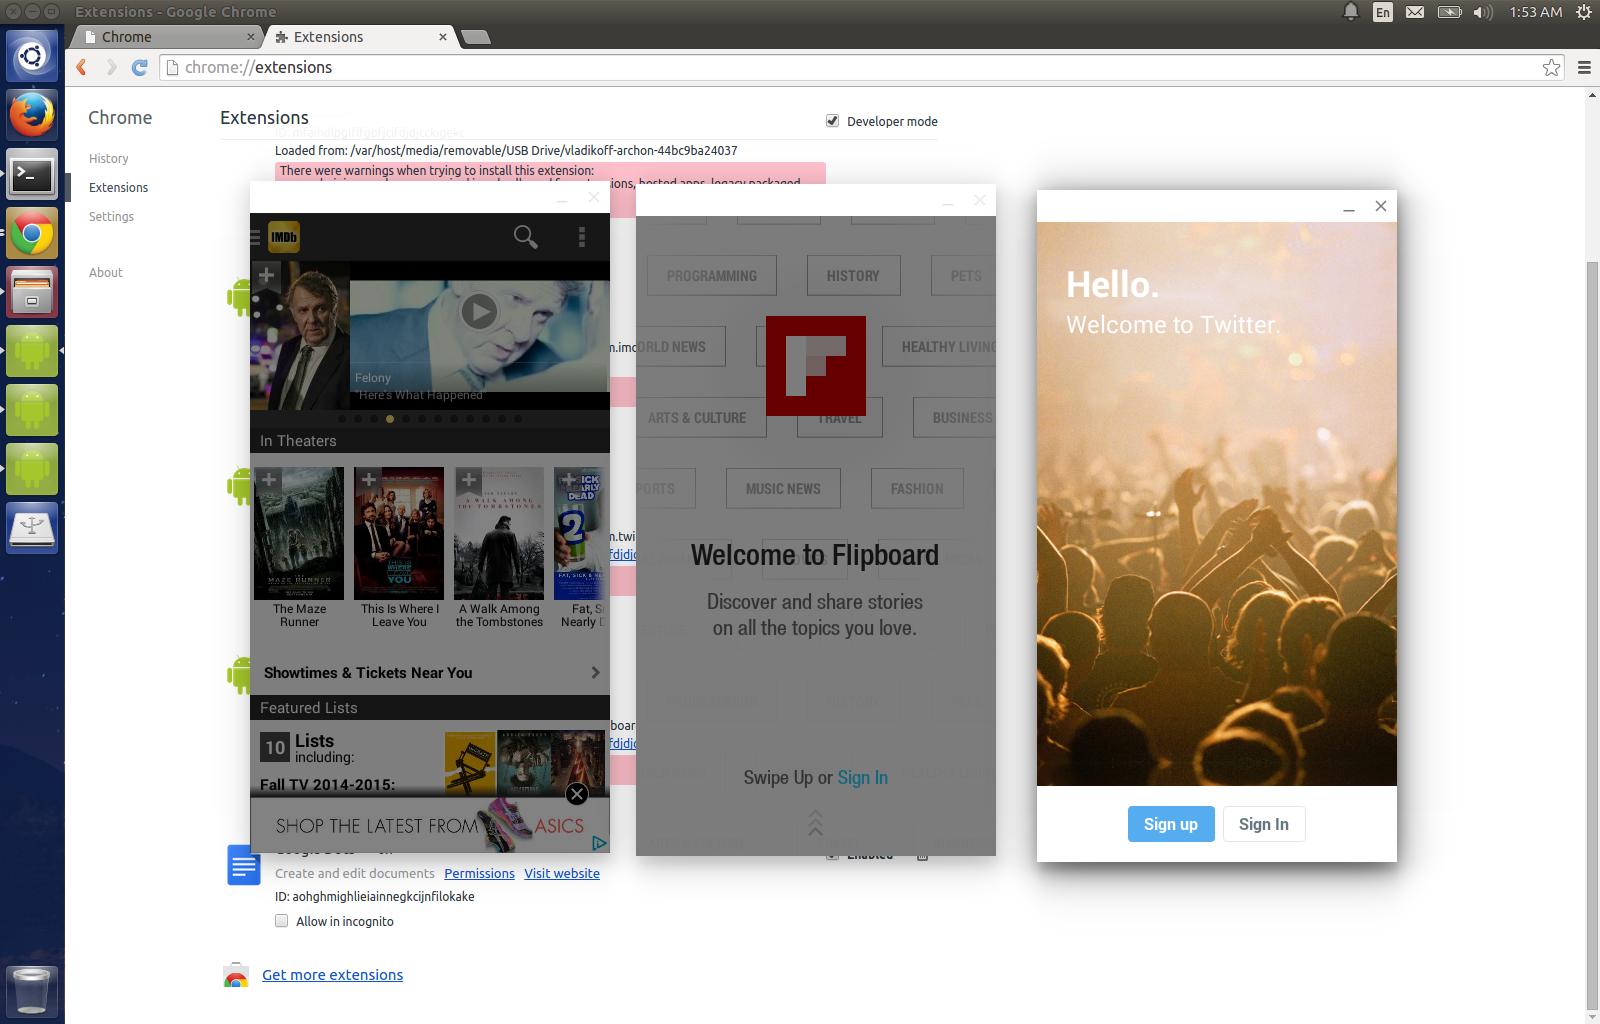 vladikoff/chromeosapk Android emulator, Linux, Android apps